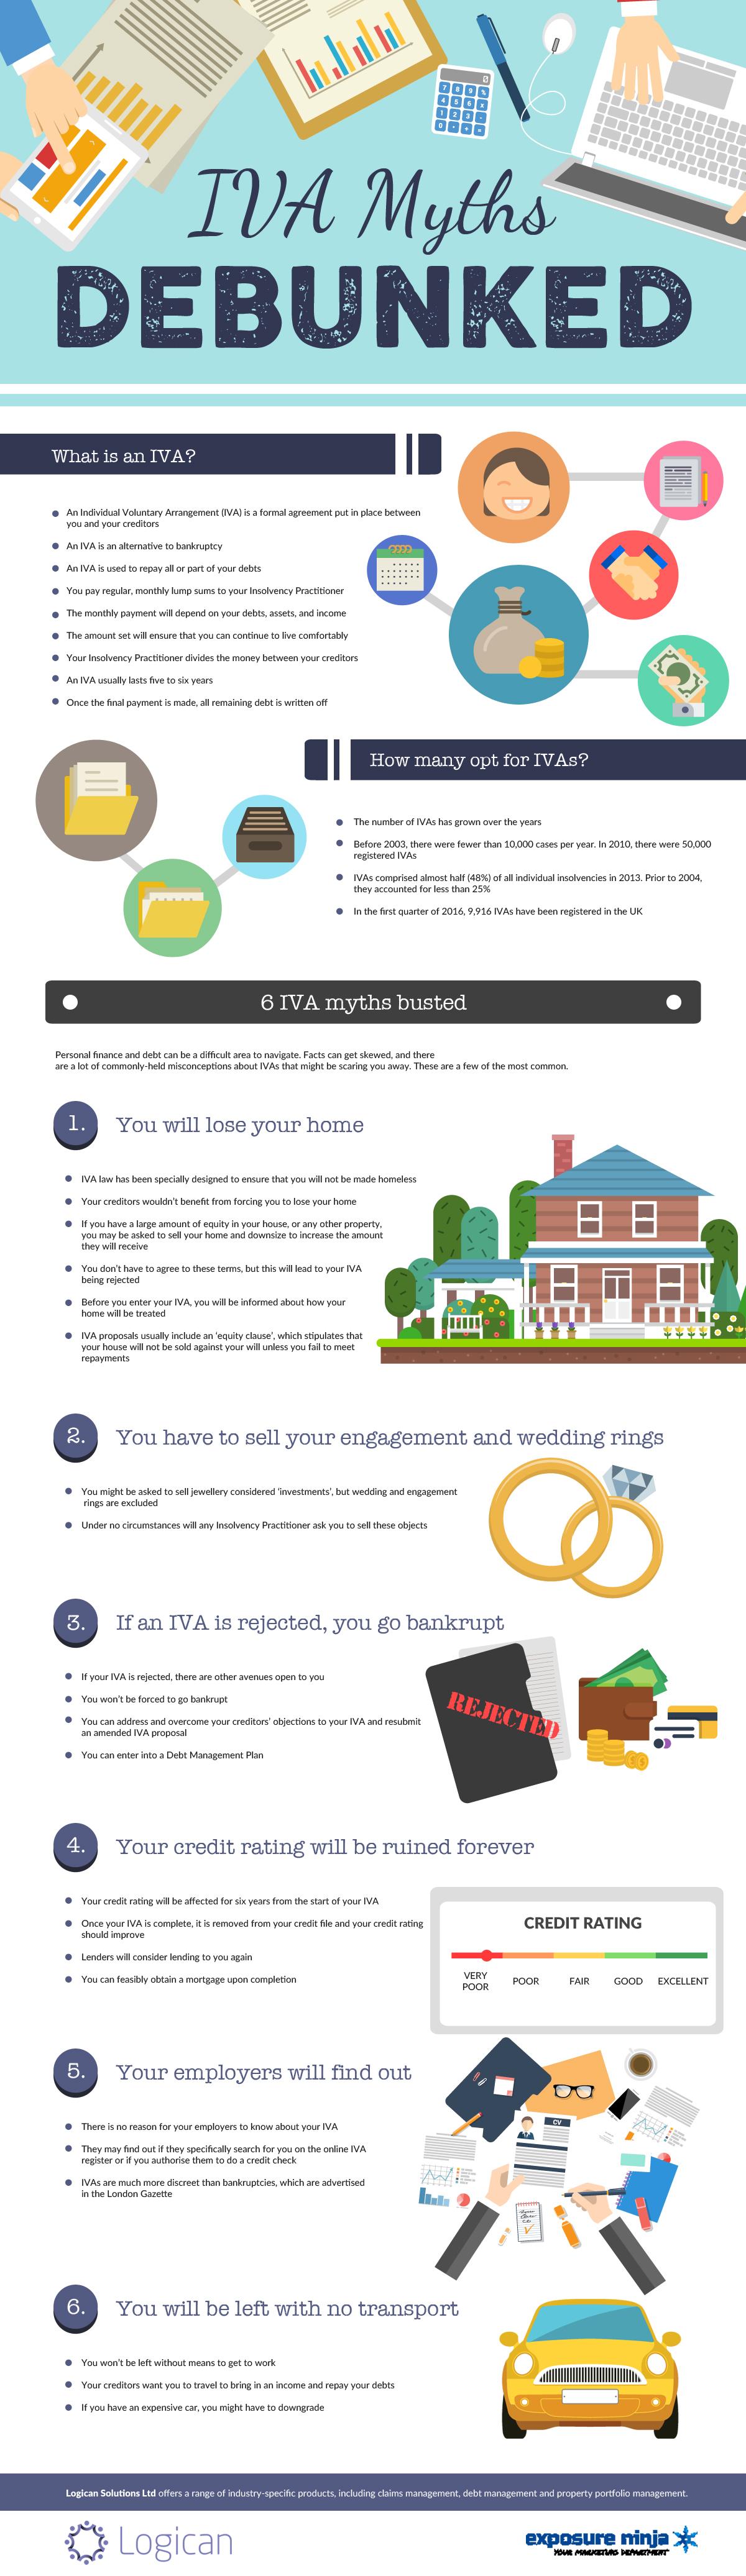 IVA myths debunked infographic